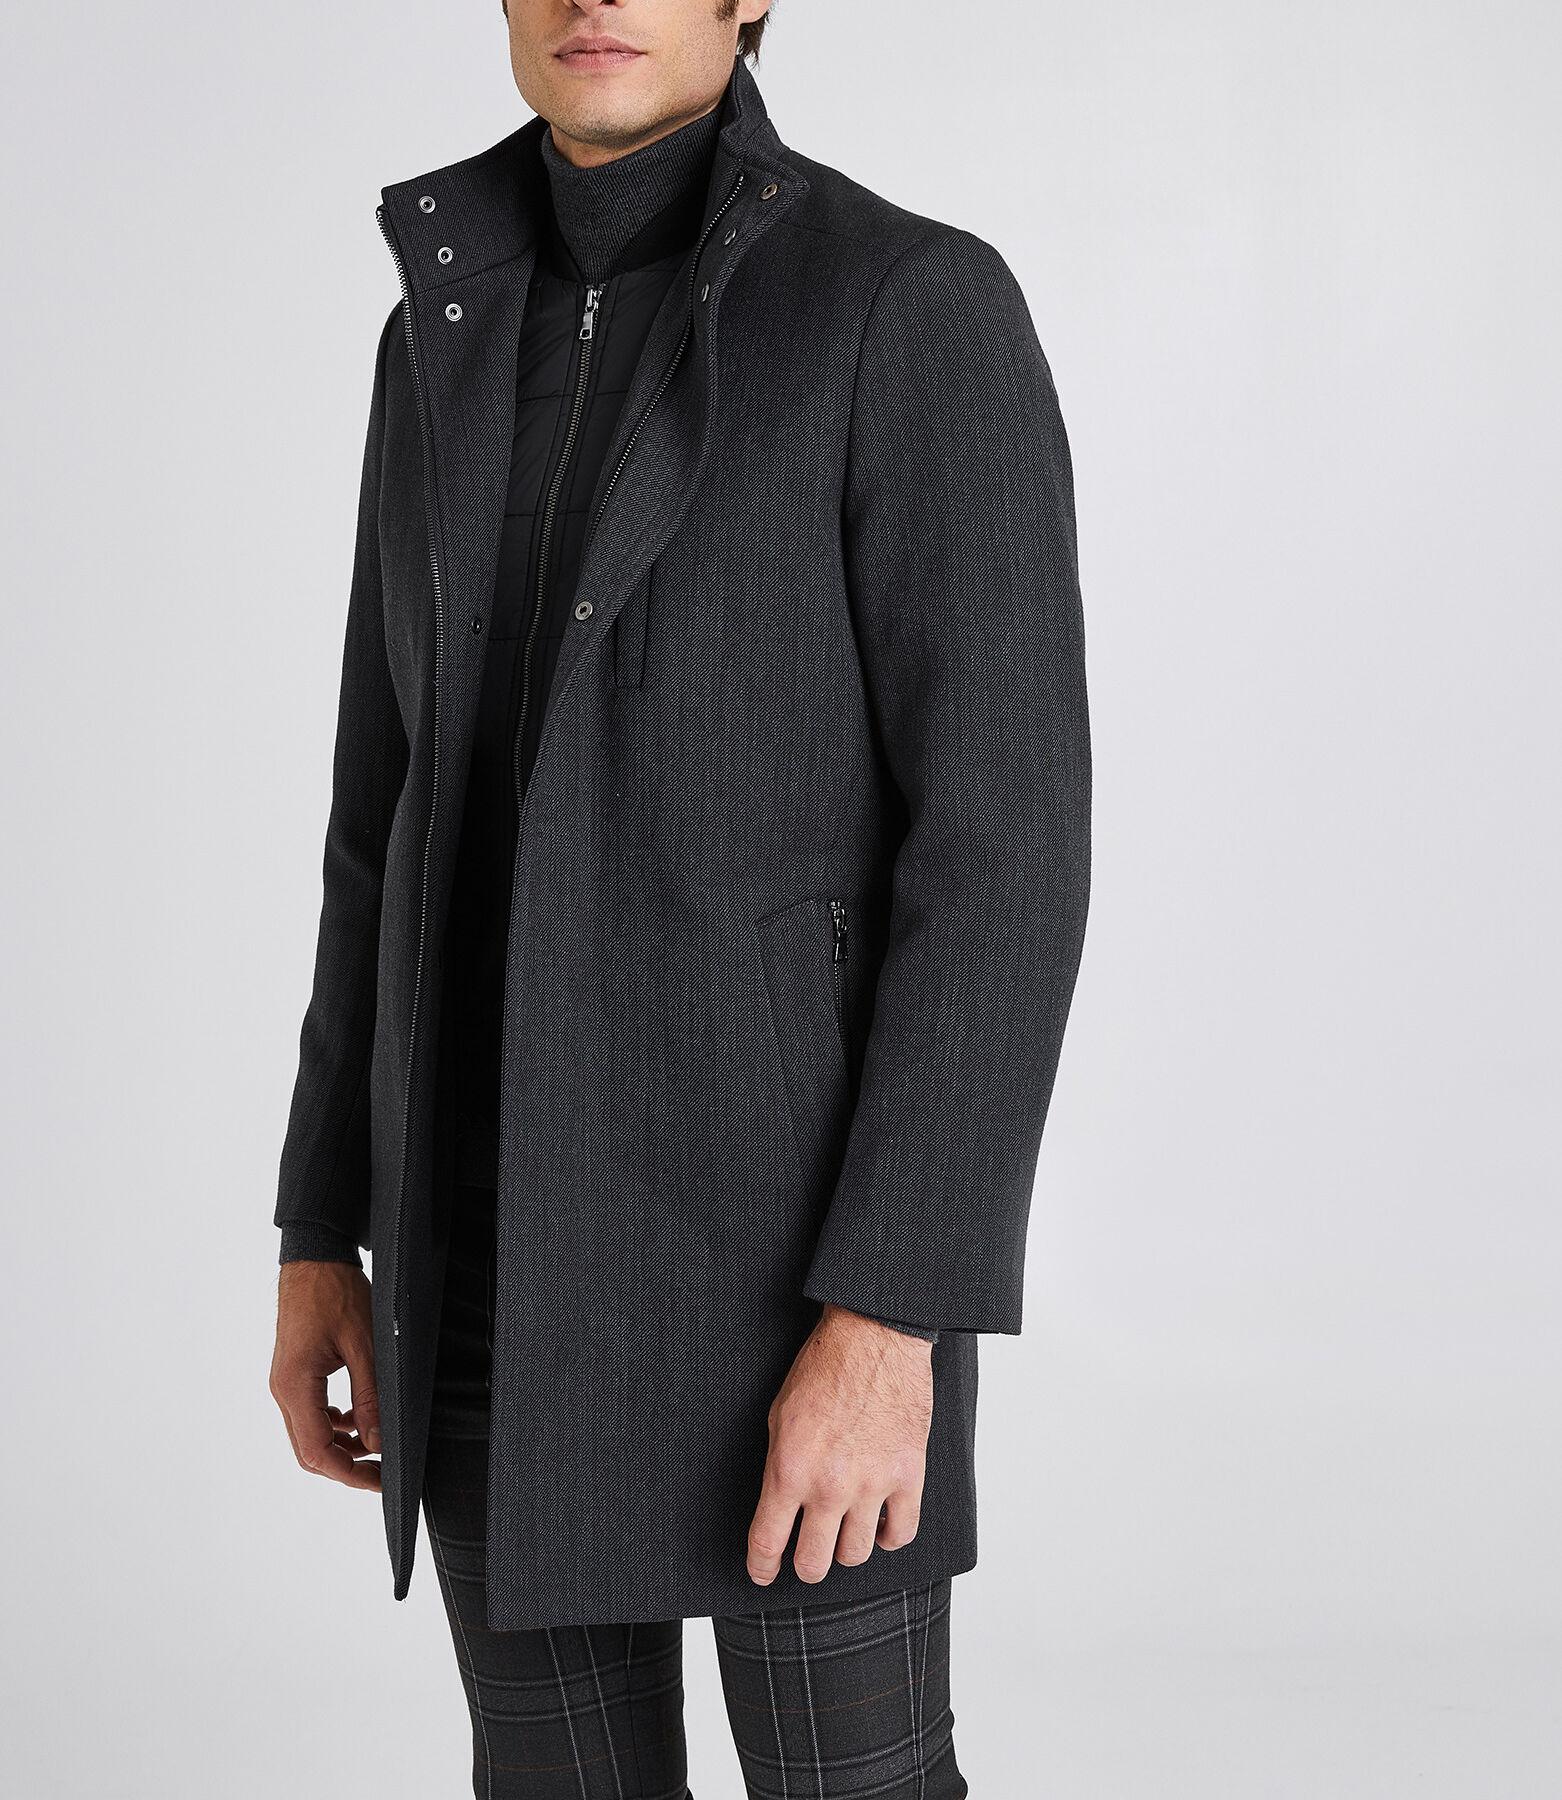 Manteau long zippé doublure amovible